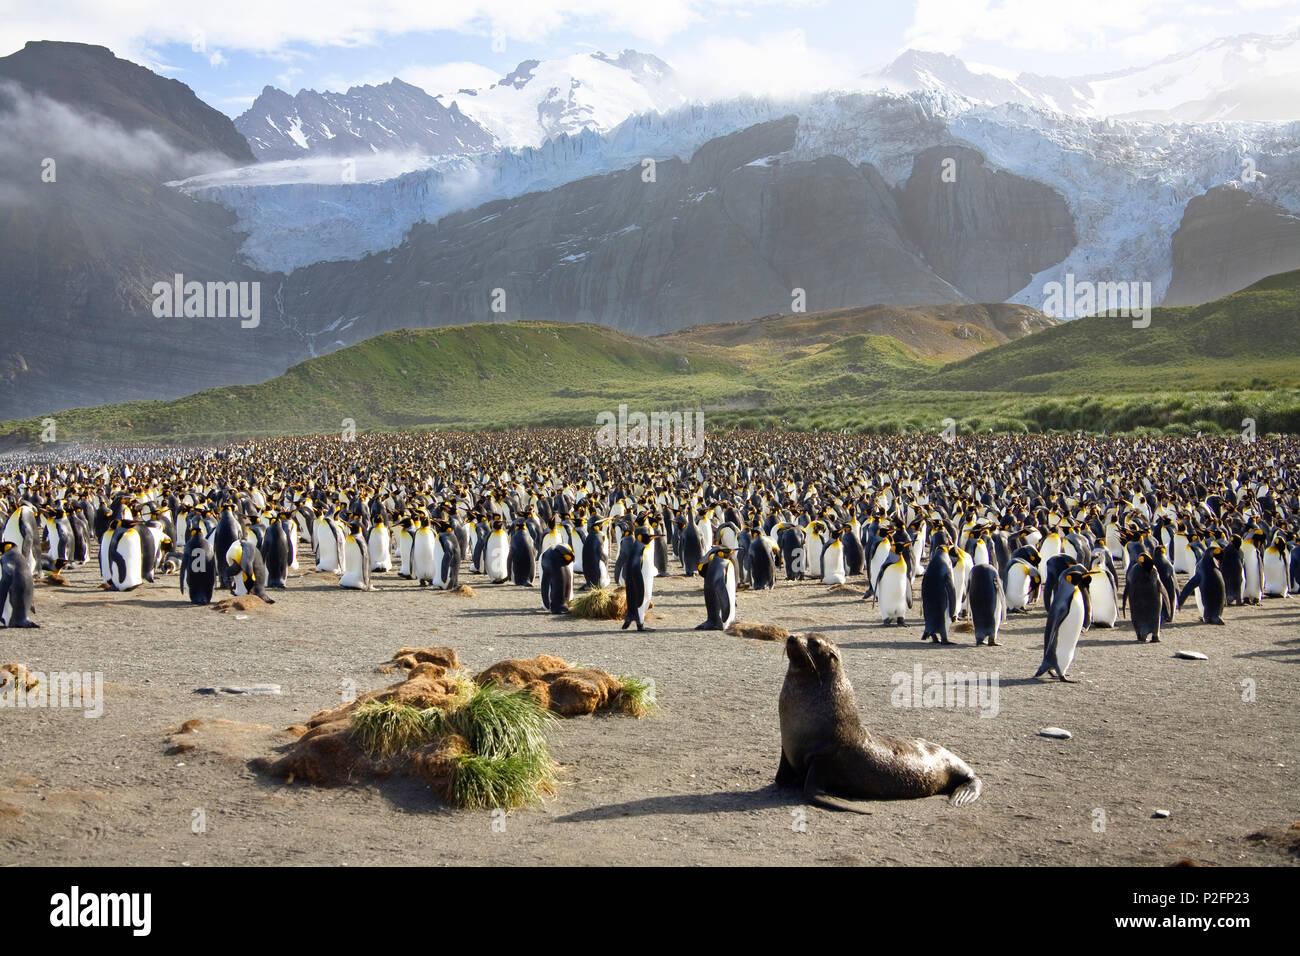 King Penguins, Aptenodytes patagonicus, colony, Gold Harbour, South Georgia, Antarctica - Stock Image